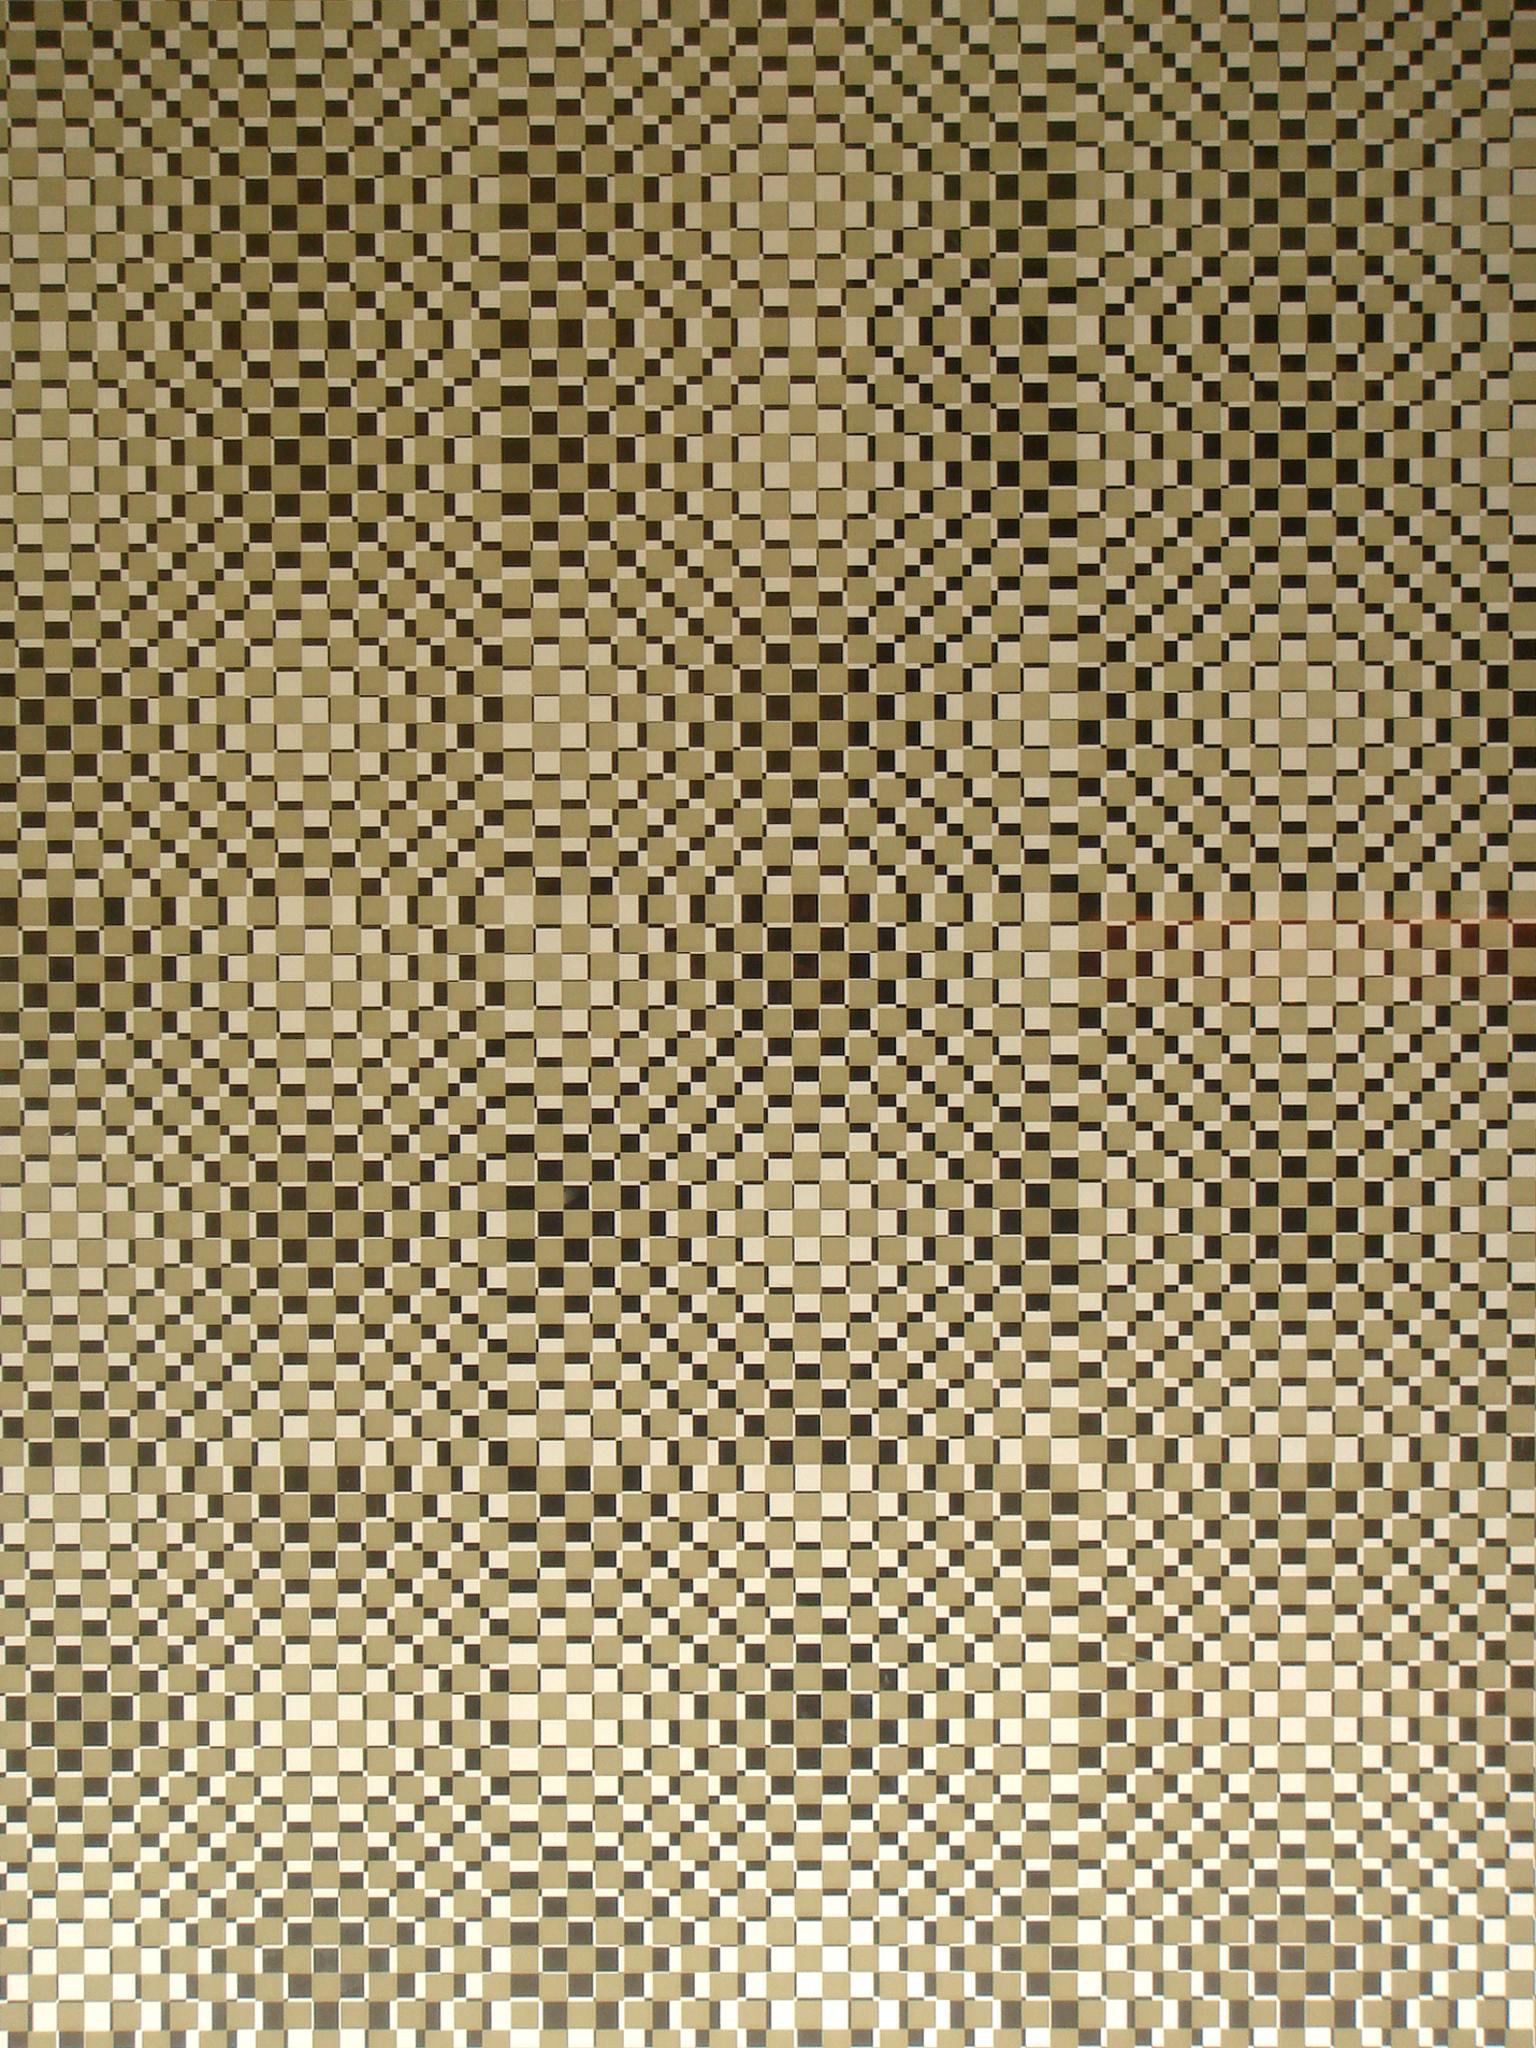 louis vuitton glass pattern flickr photo sharing. Black Bedroom Furniture Sets. Home Design Ideas